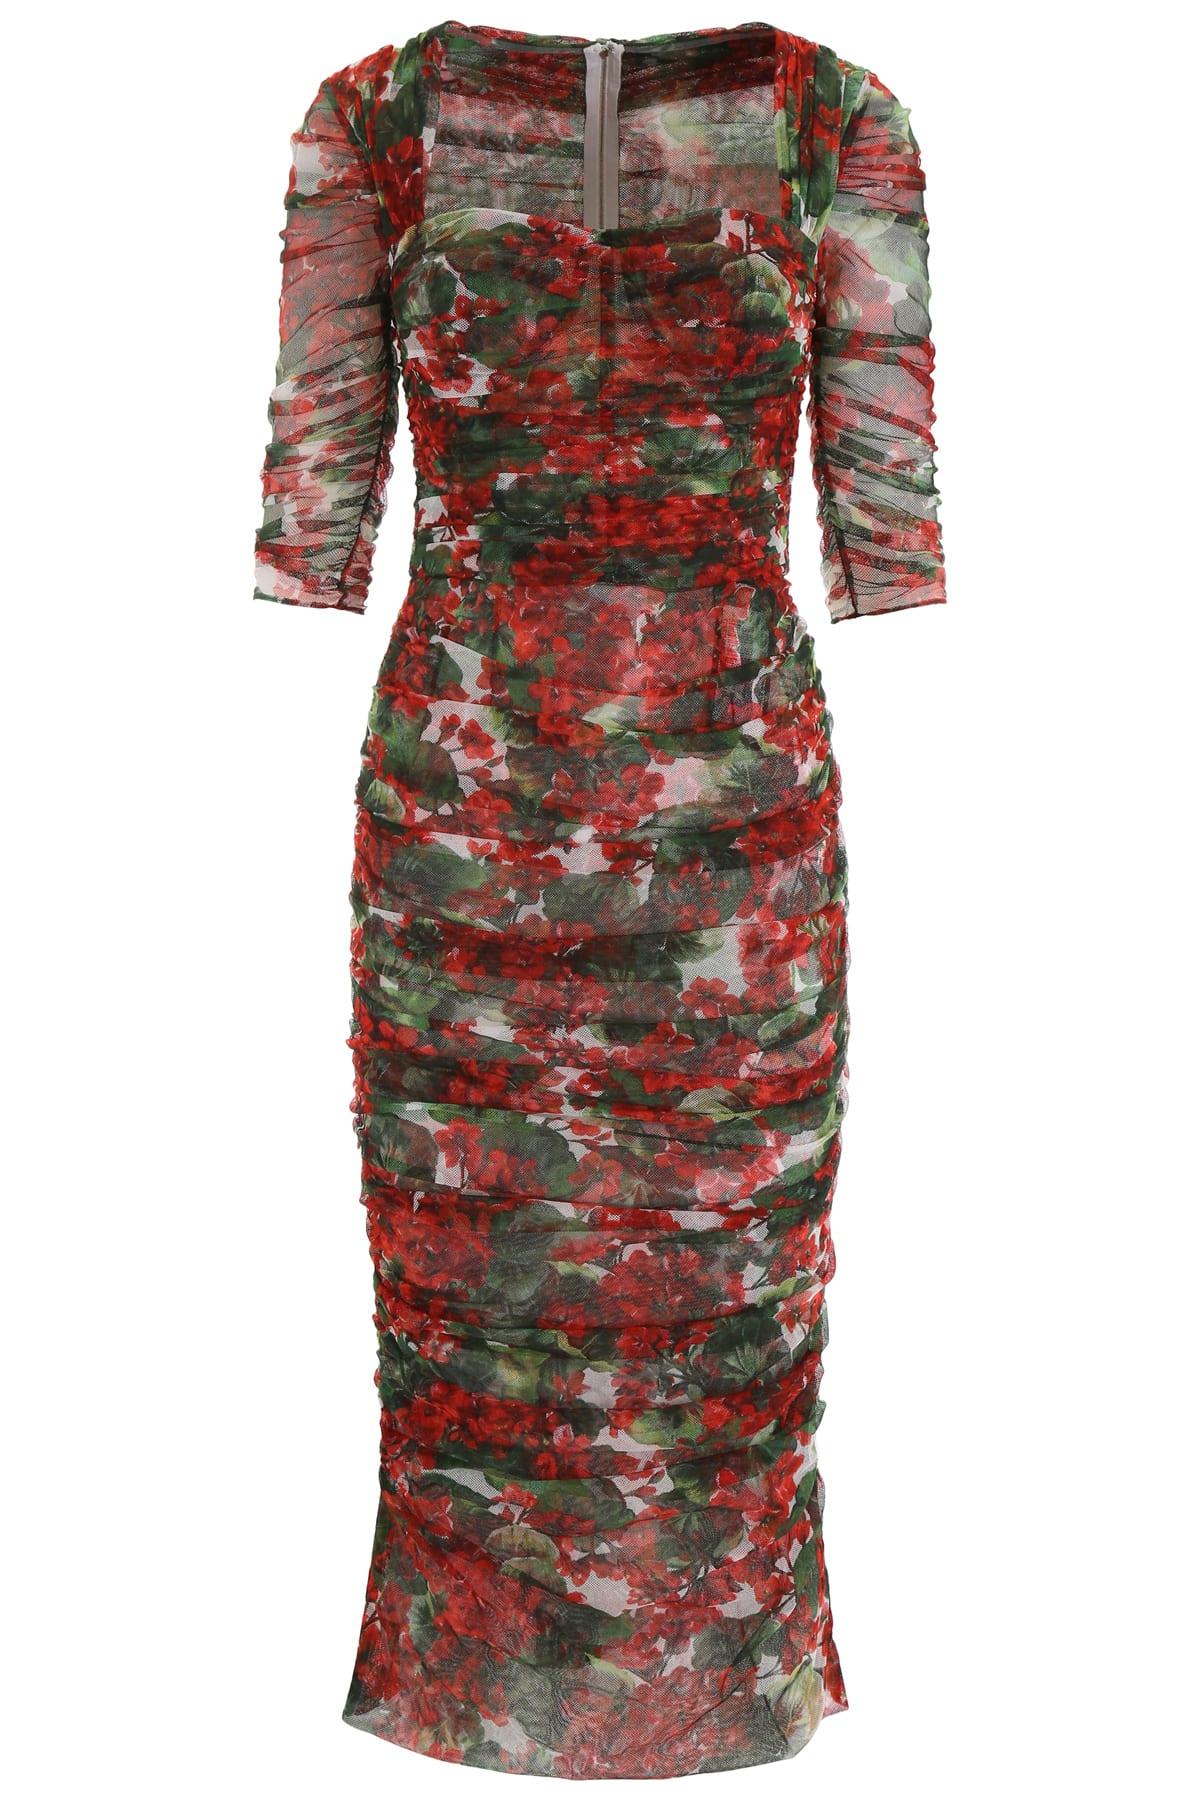 Dolce & Gabbana Portofino Tulle Dress